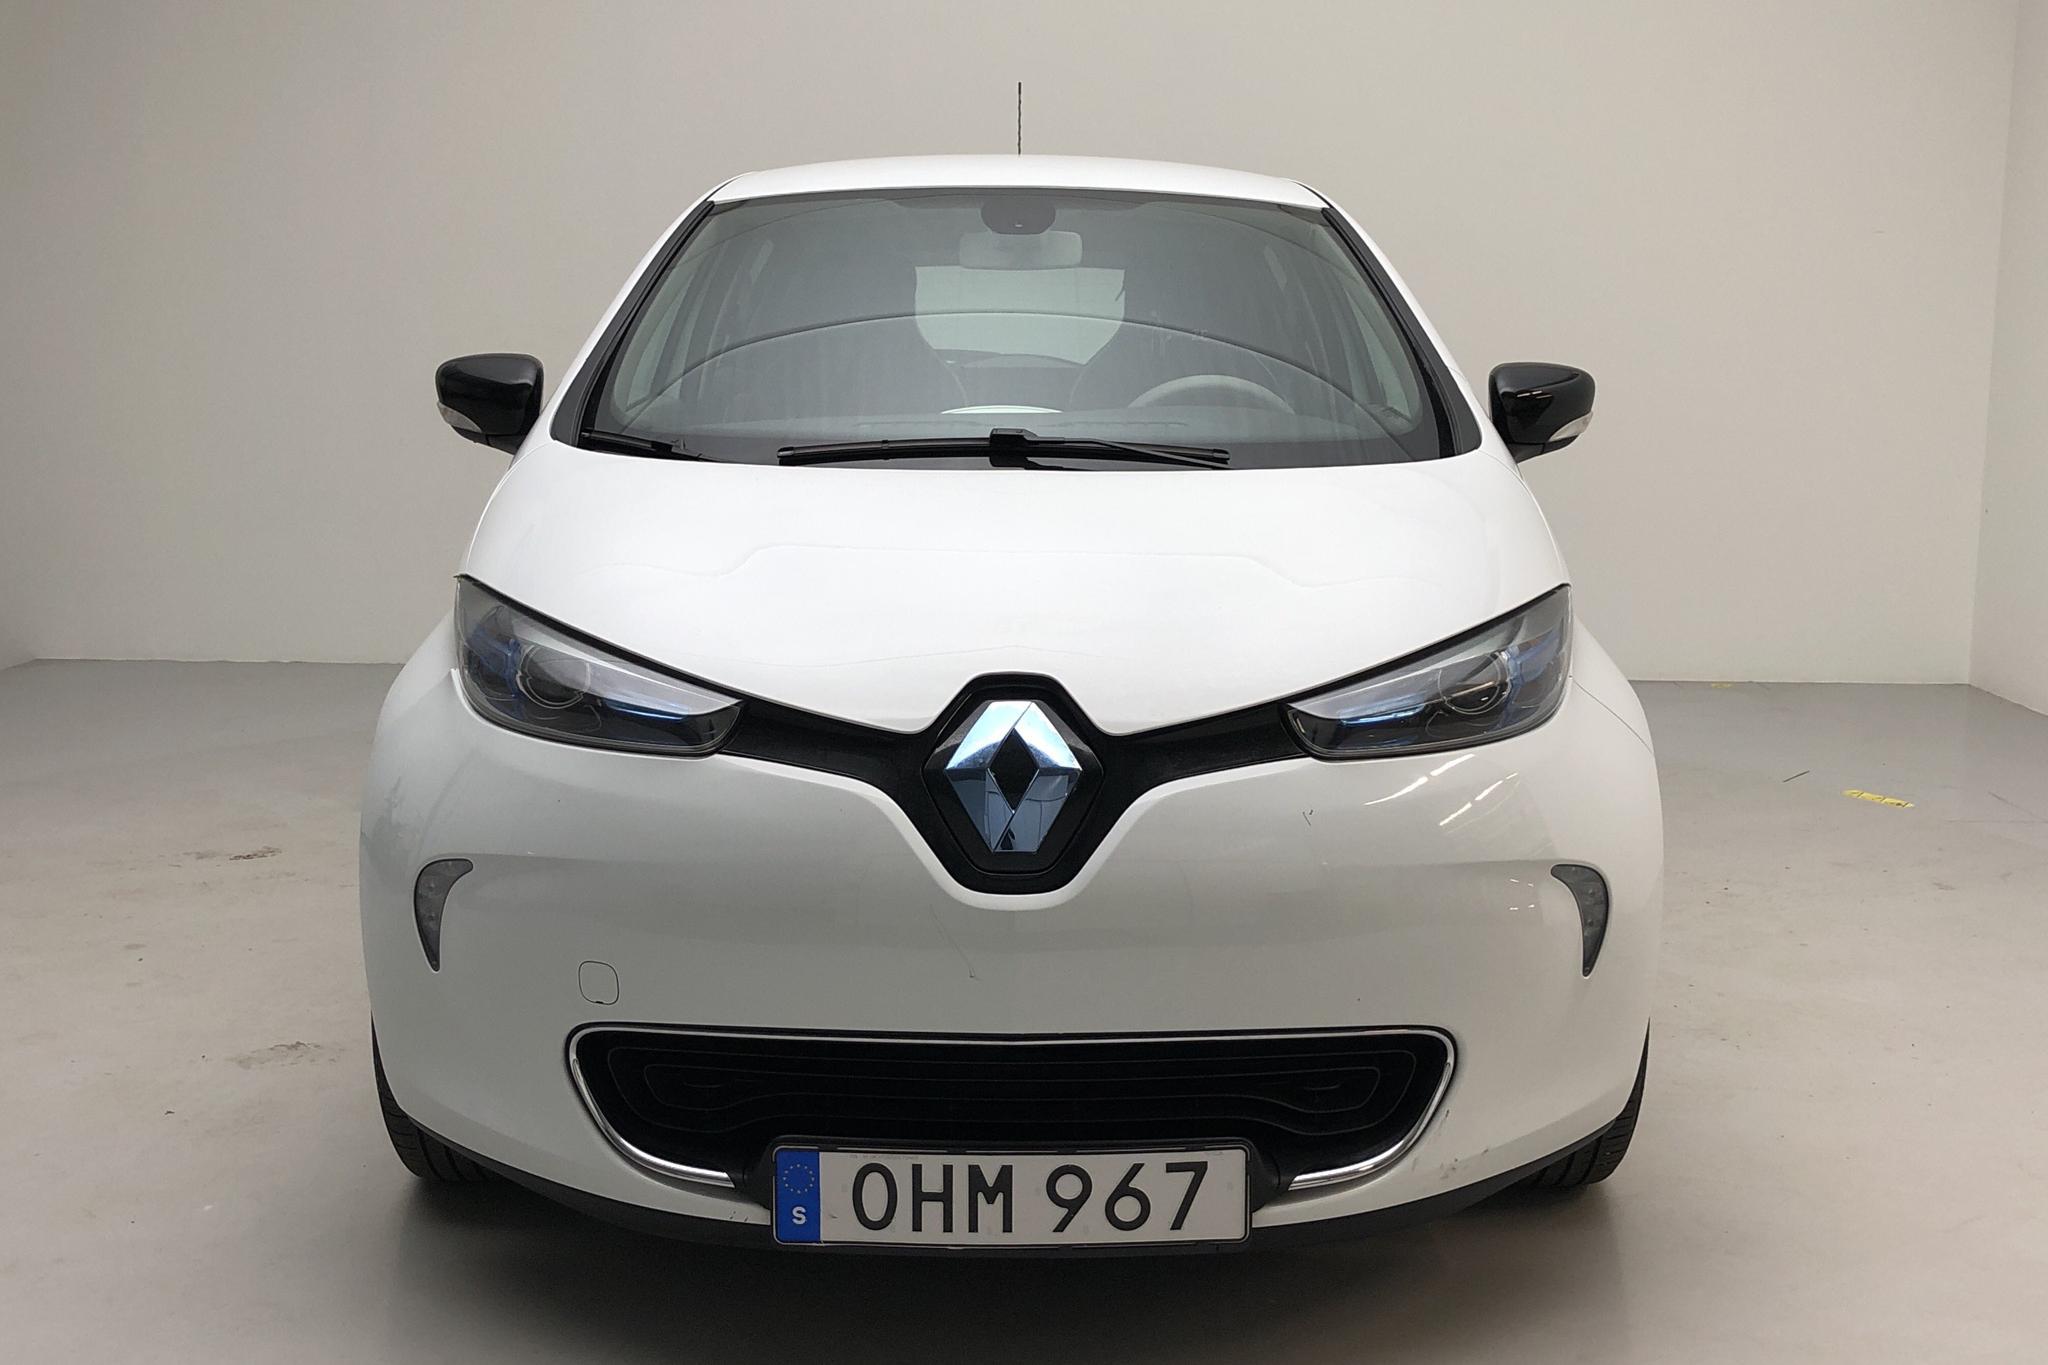 Renault Zoe 22 kWh (88hk) - 98 720 km - Automatic - white - 2017